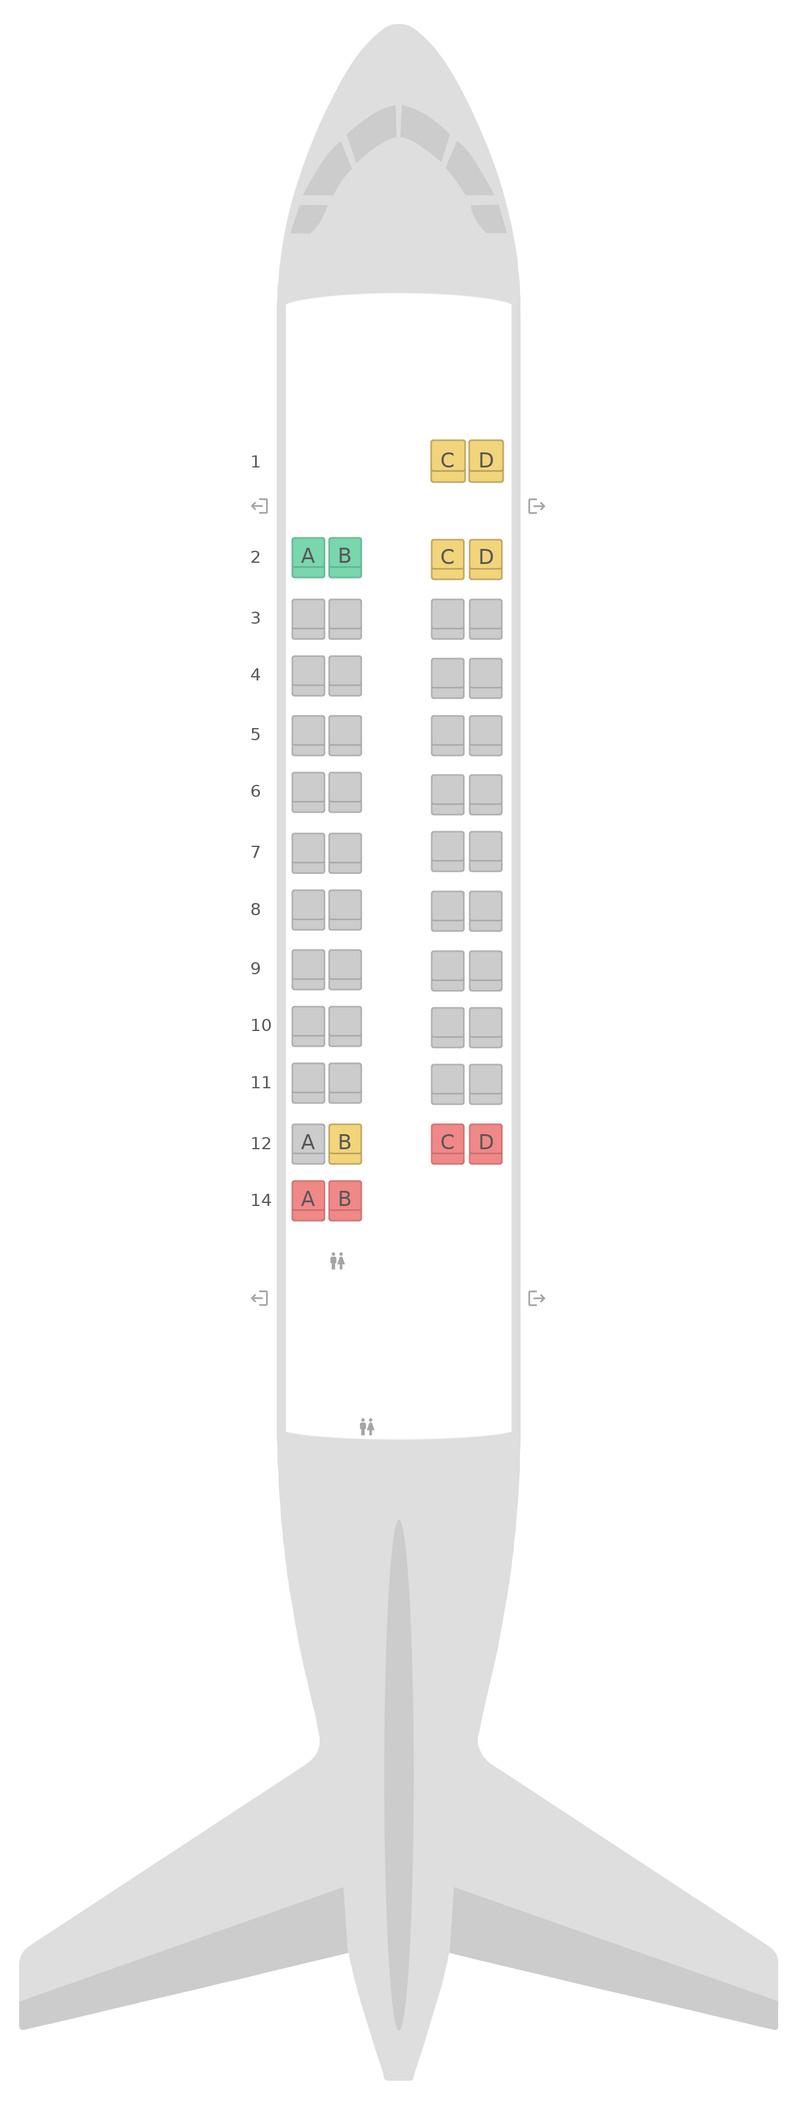 Схема салона АТР 42-600 (AT6) Aegean Airlines